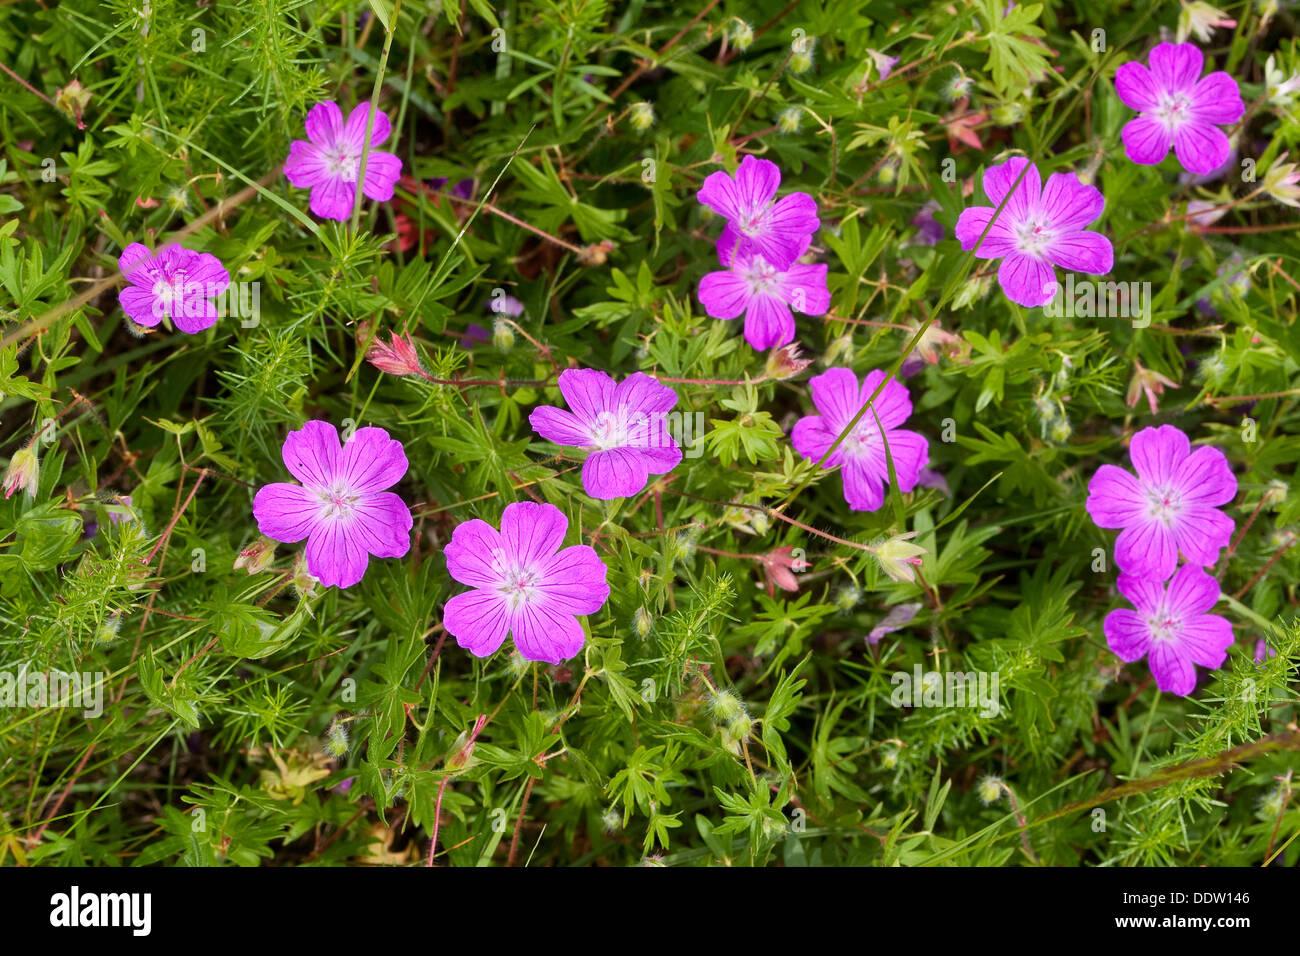 Bloody Cranesbill, bloody geranium, Blutroter-Storchschnabel, Blut-Storchschnabel, Blutroter Storchschnabel, Geranium sanguineum - Stock Image